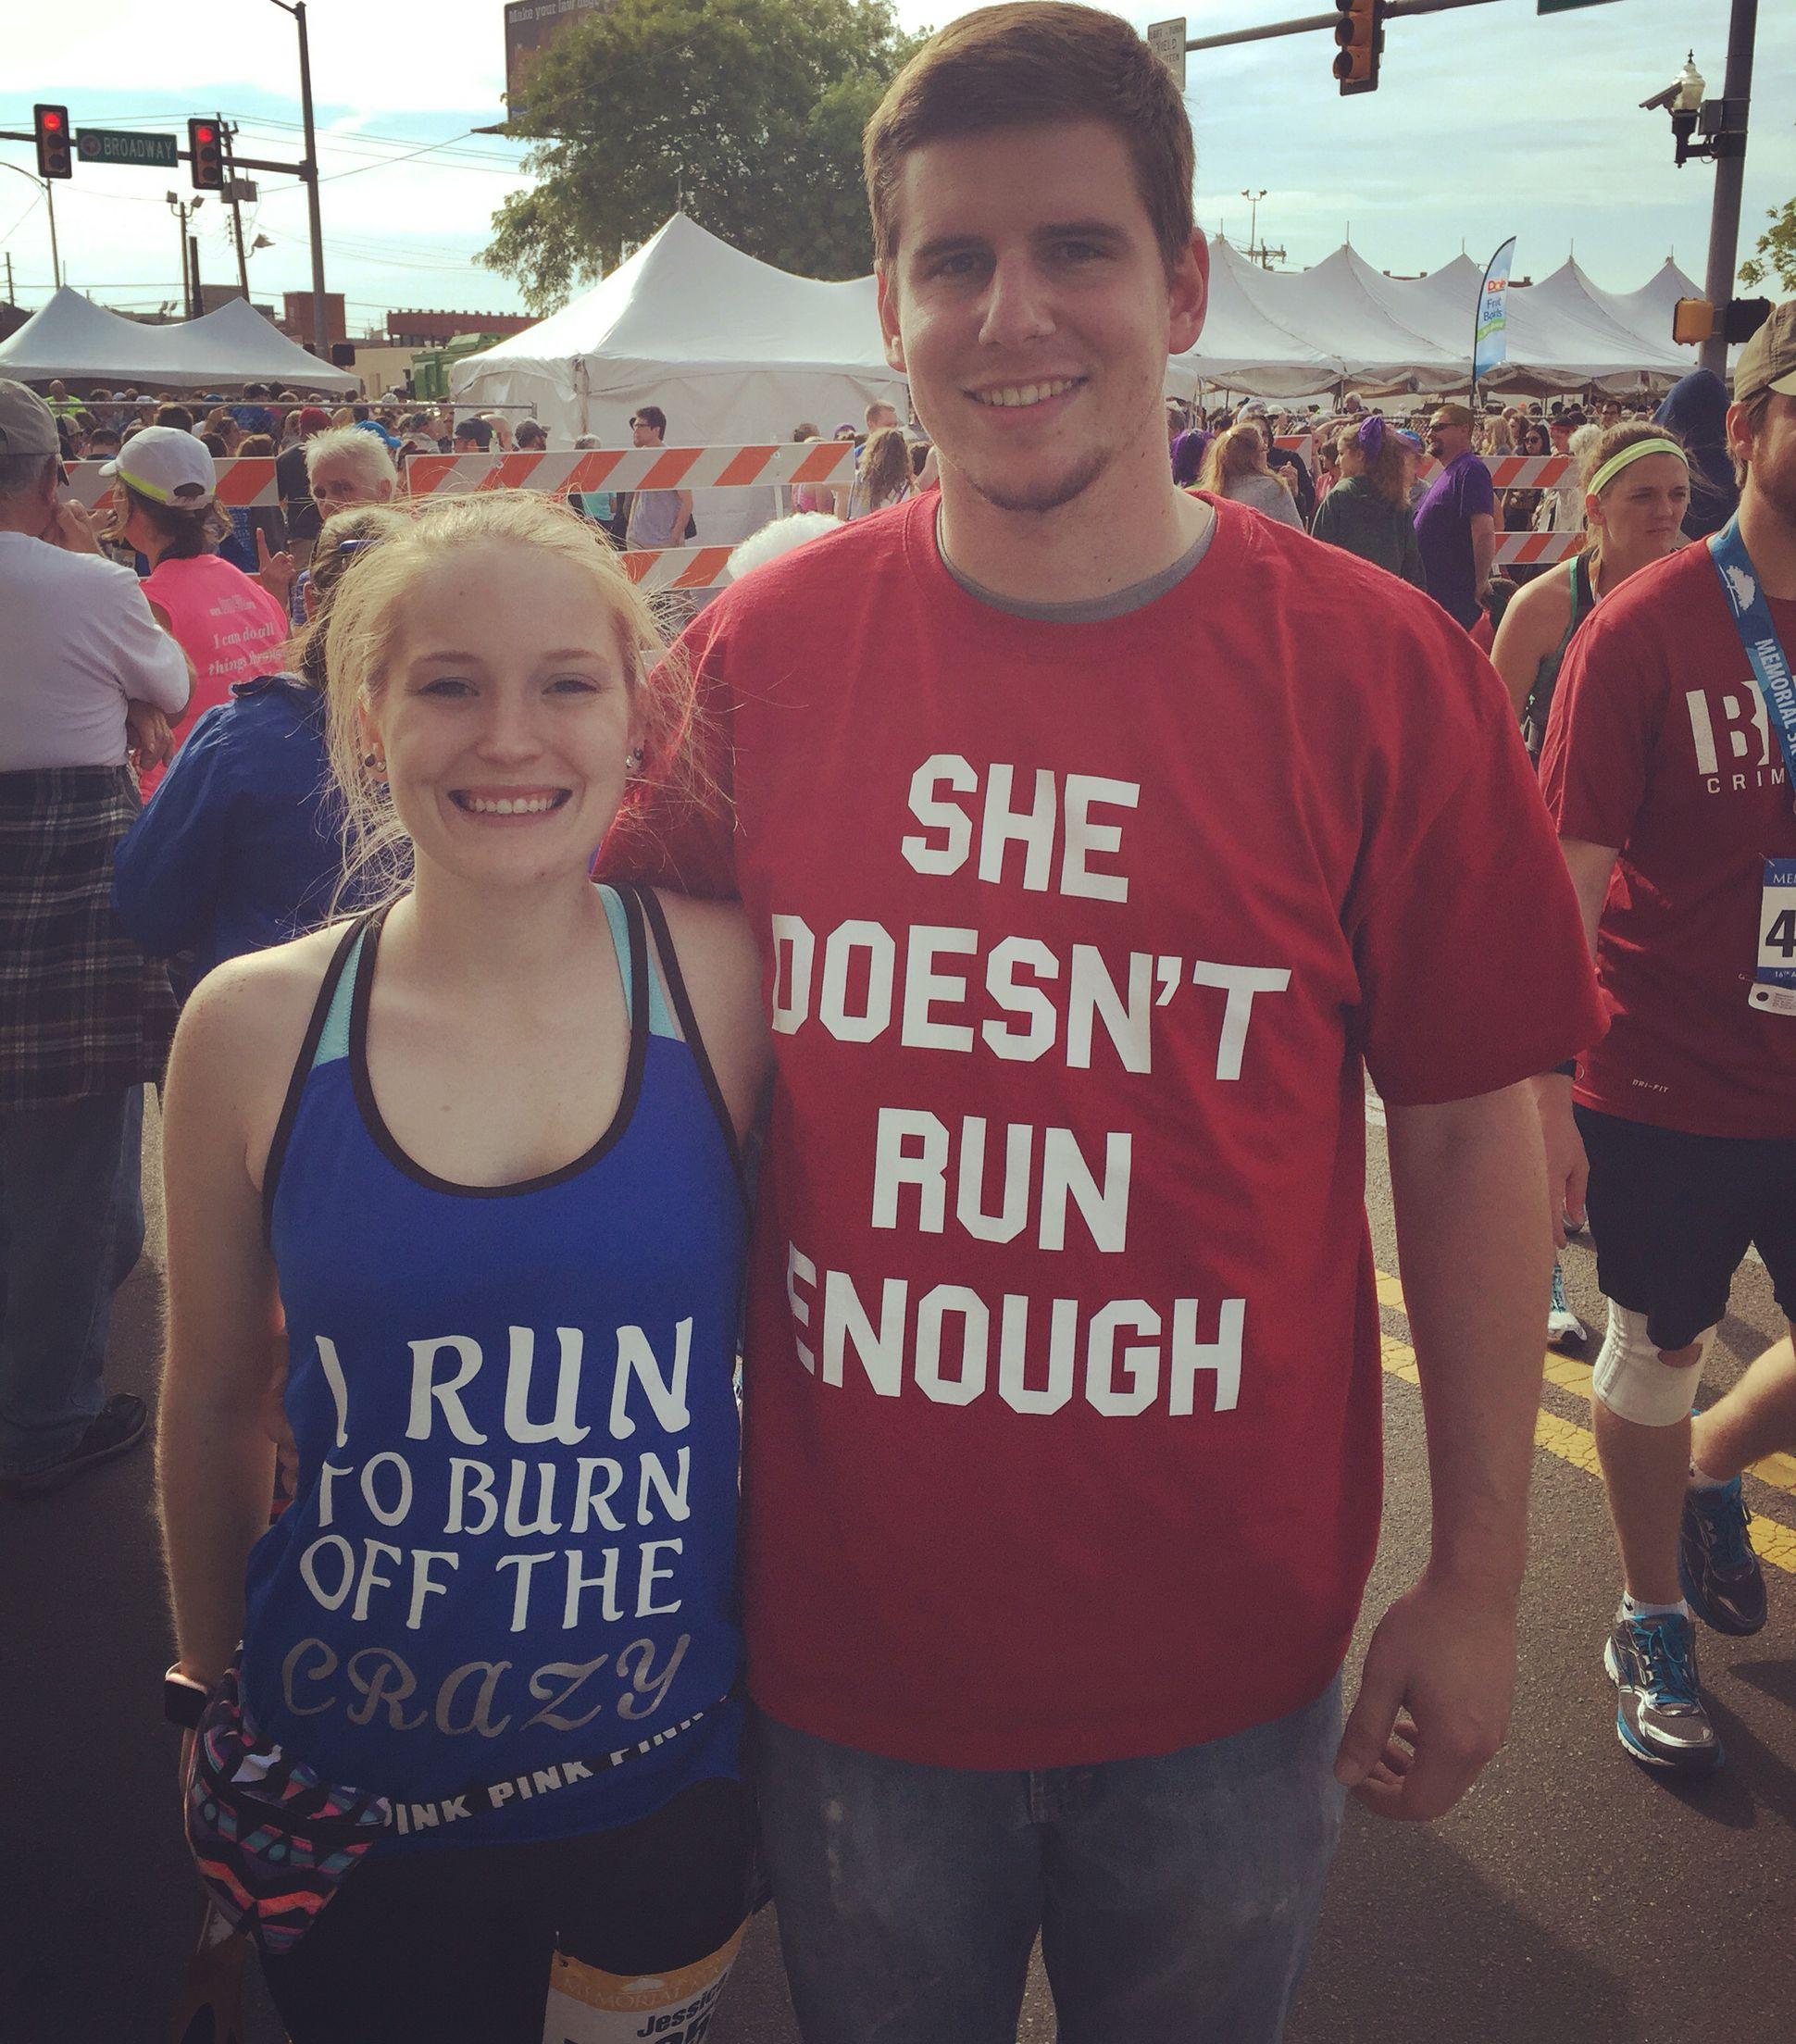 8f647dc16 Funny couple running shirt for half marathon | Him❤ | Funny running ...